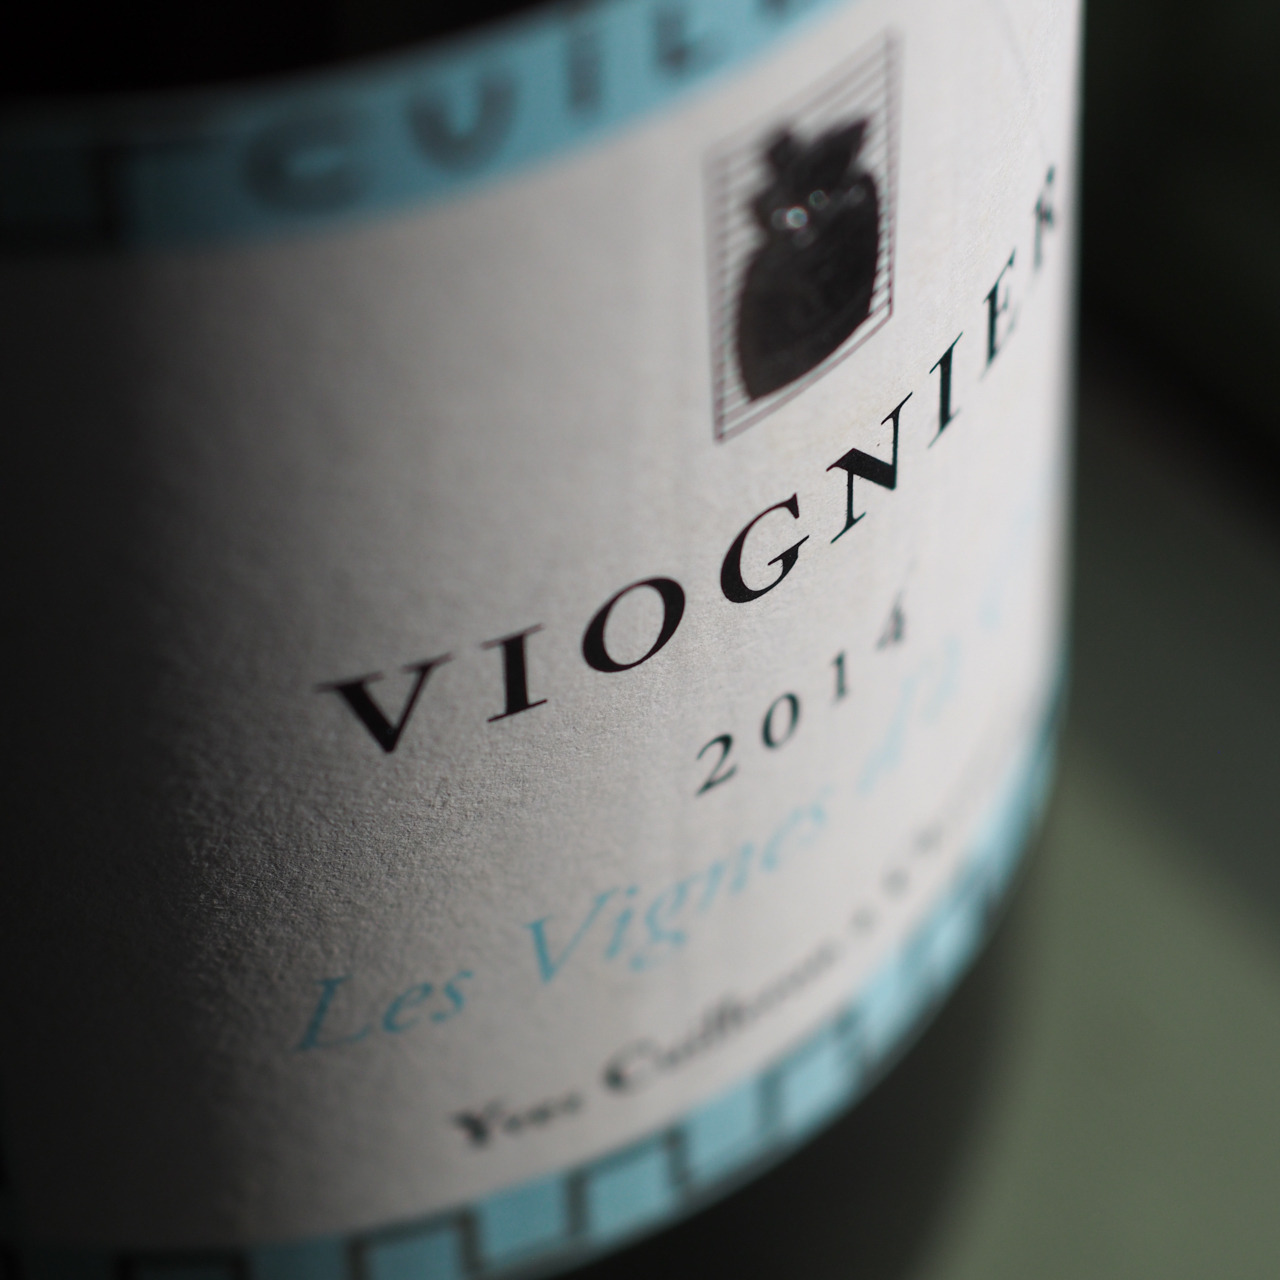 Yves Cuilleron Viognier (2013)